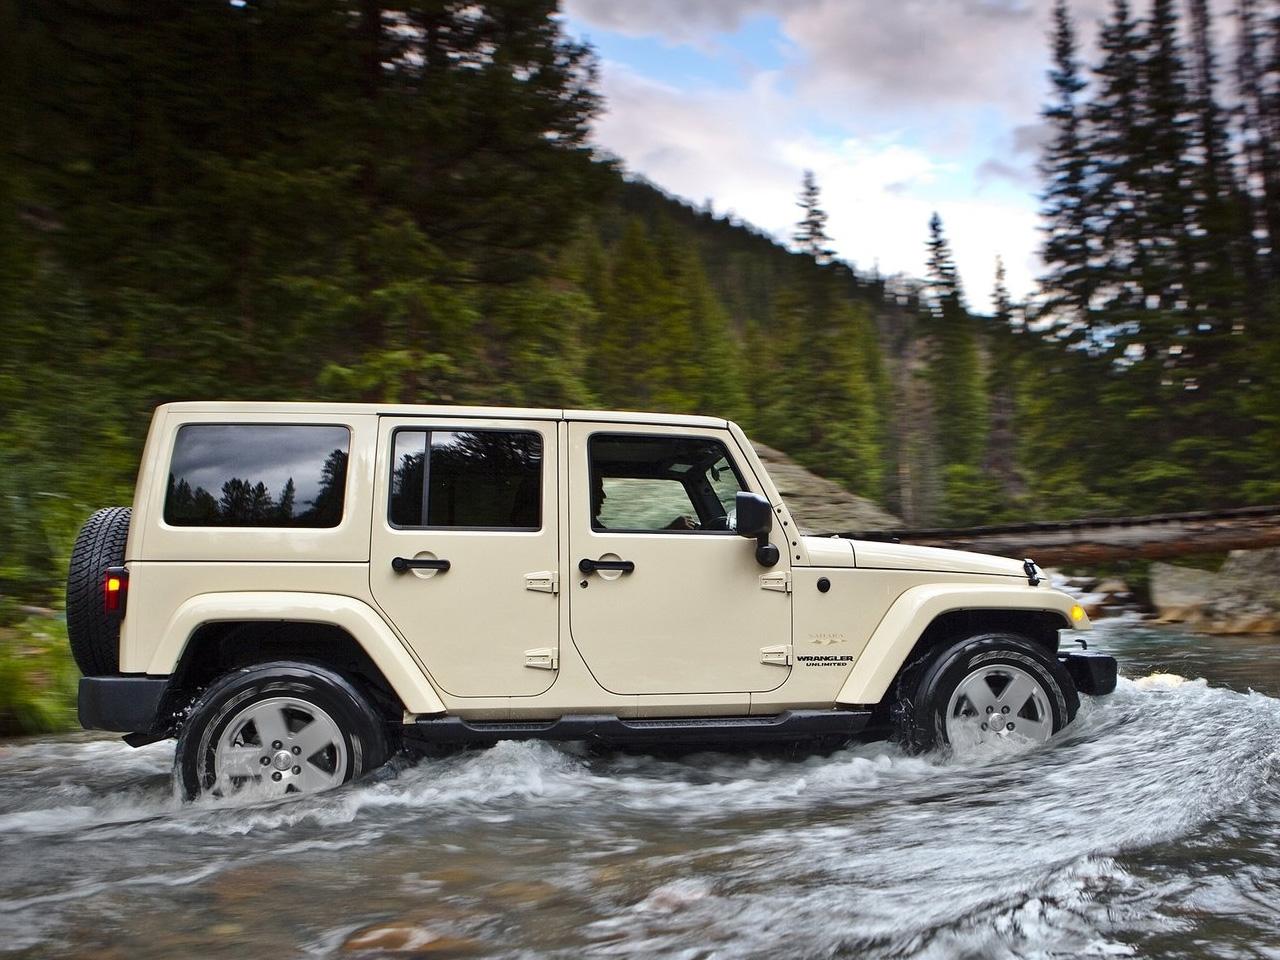 jeep wrangler unlimited sahara picture 10 reviews news specs buy car. Black Bedroom Furniture Sets. Home Design Ideas